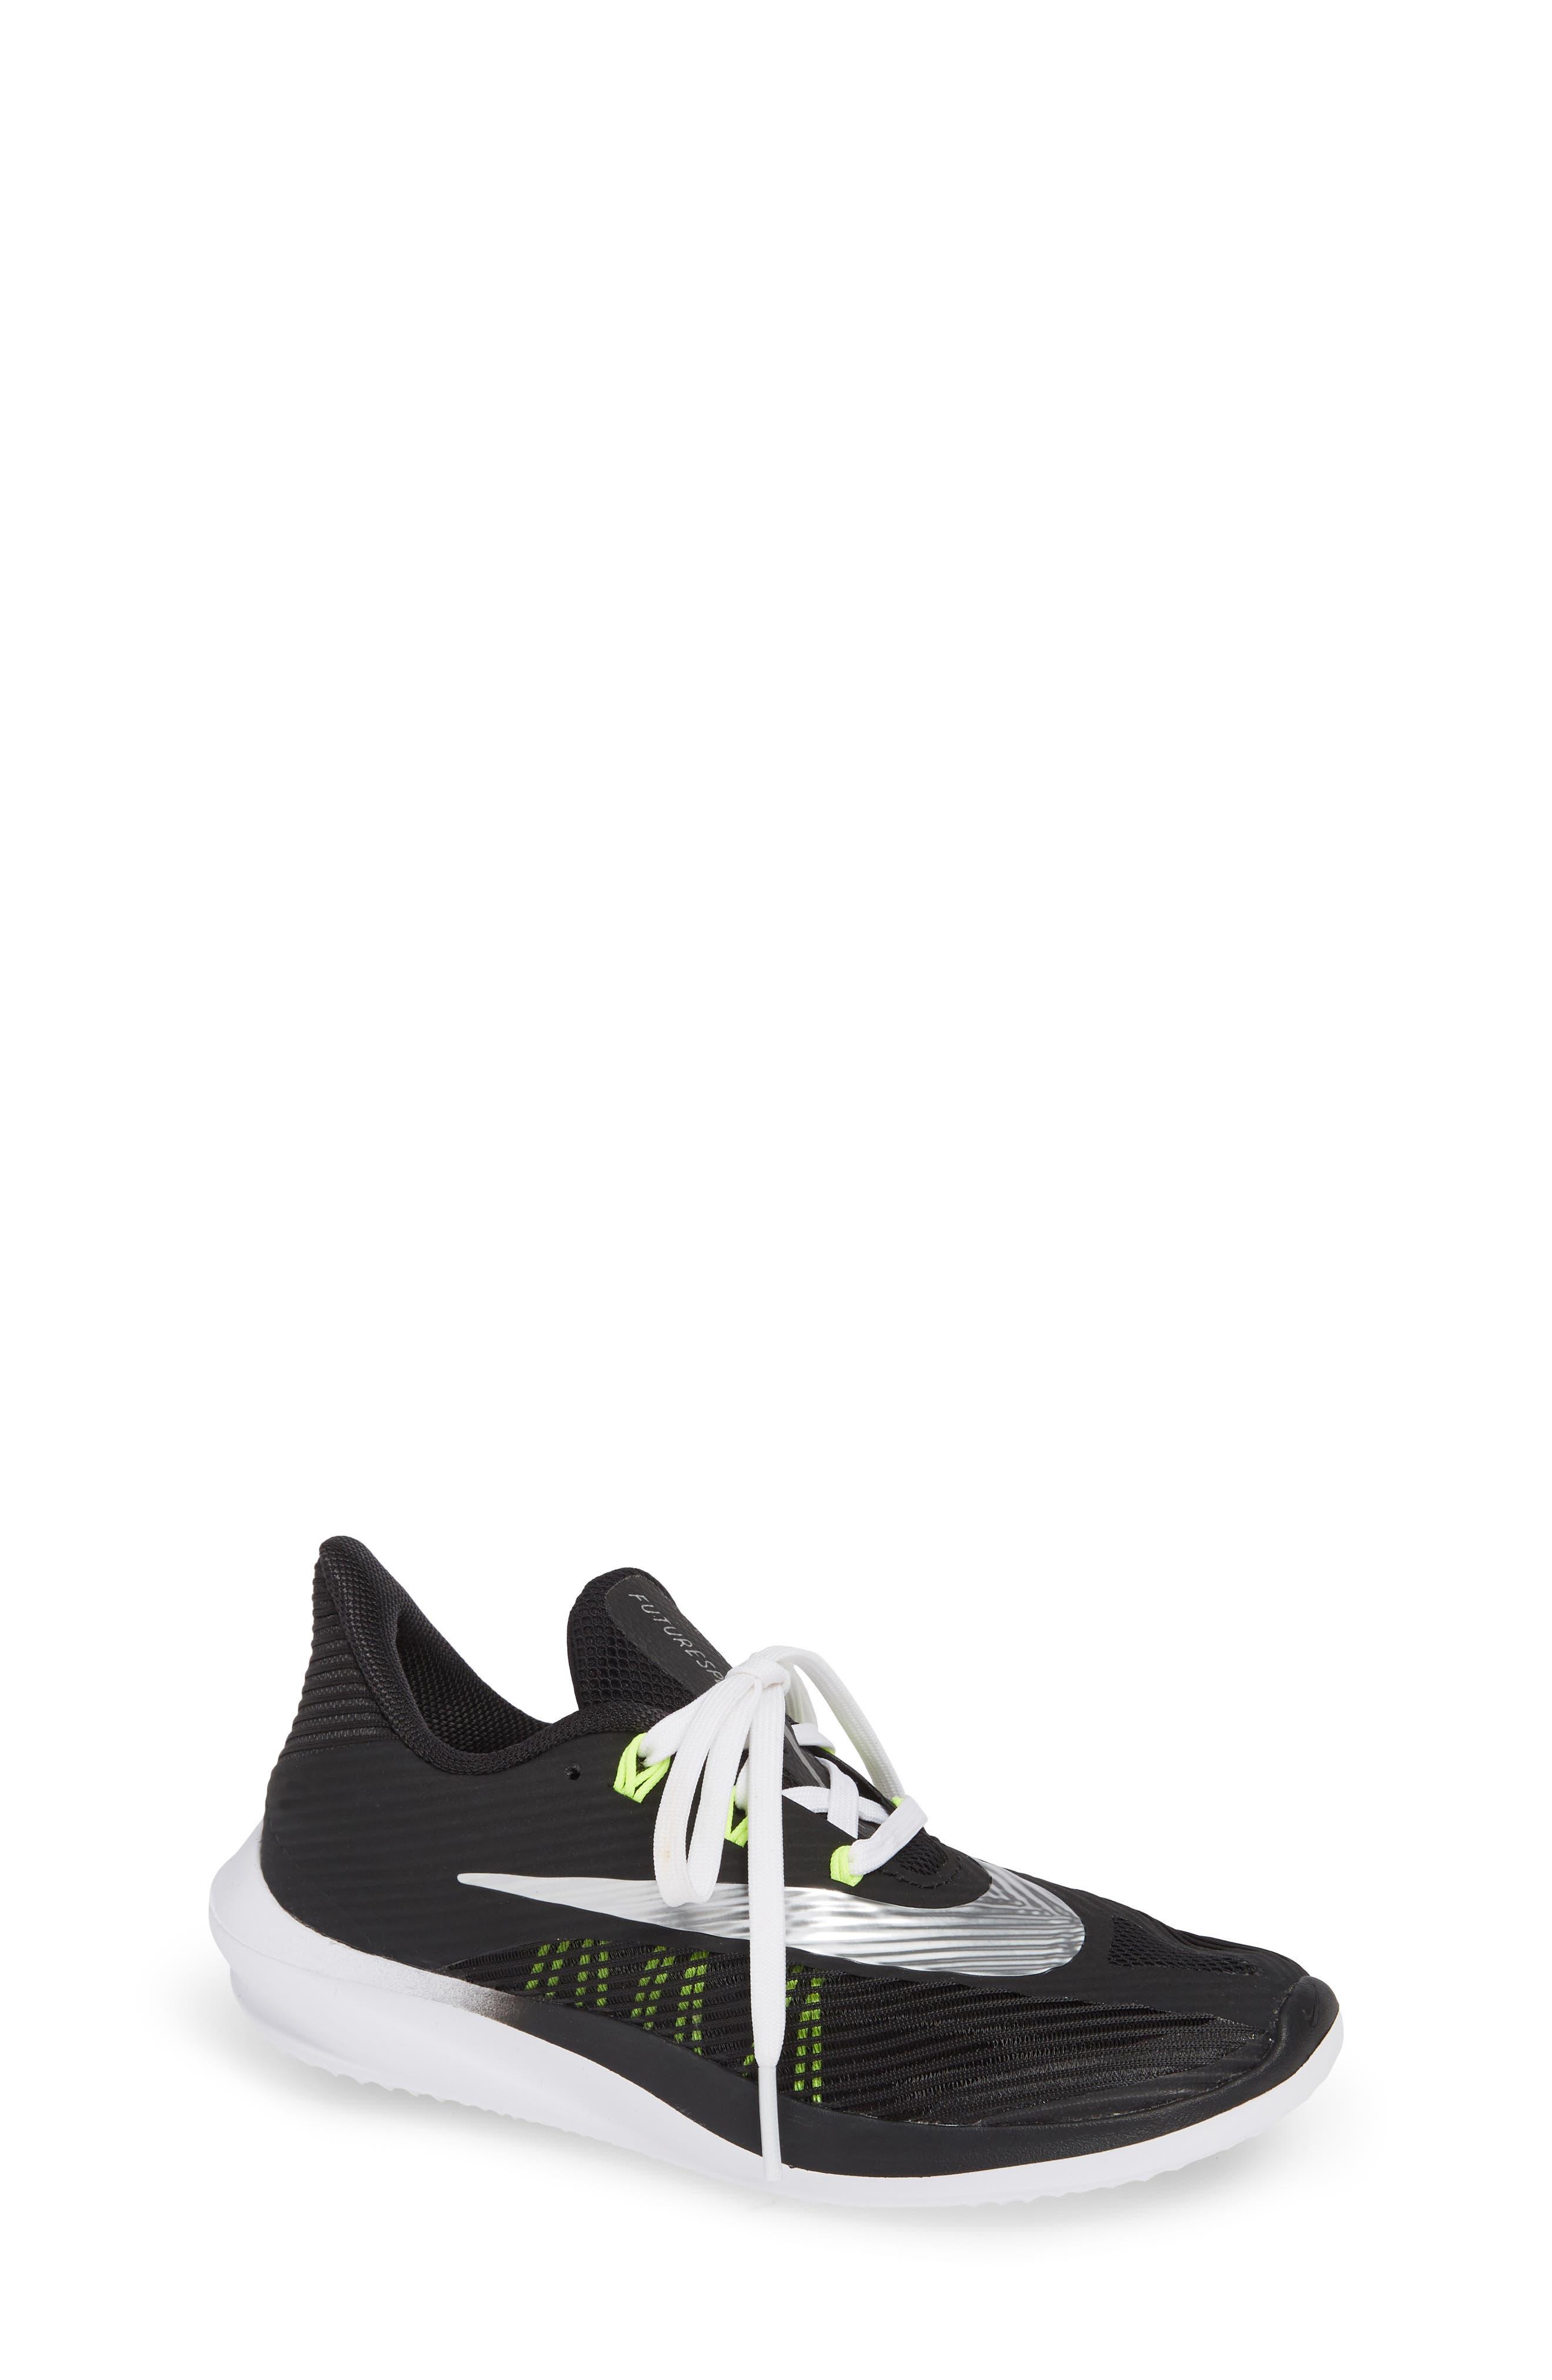 NIKE Future Speed Running Shoe, Main, color, BLACK/ CHROME-WHITE-VOLT